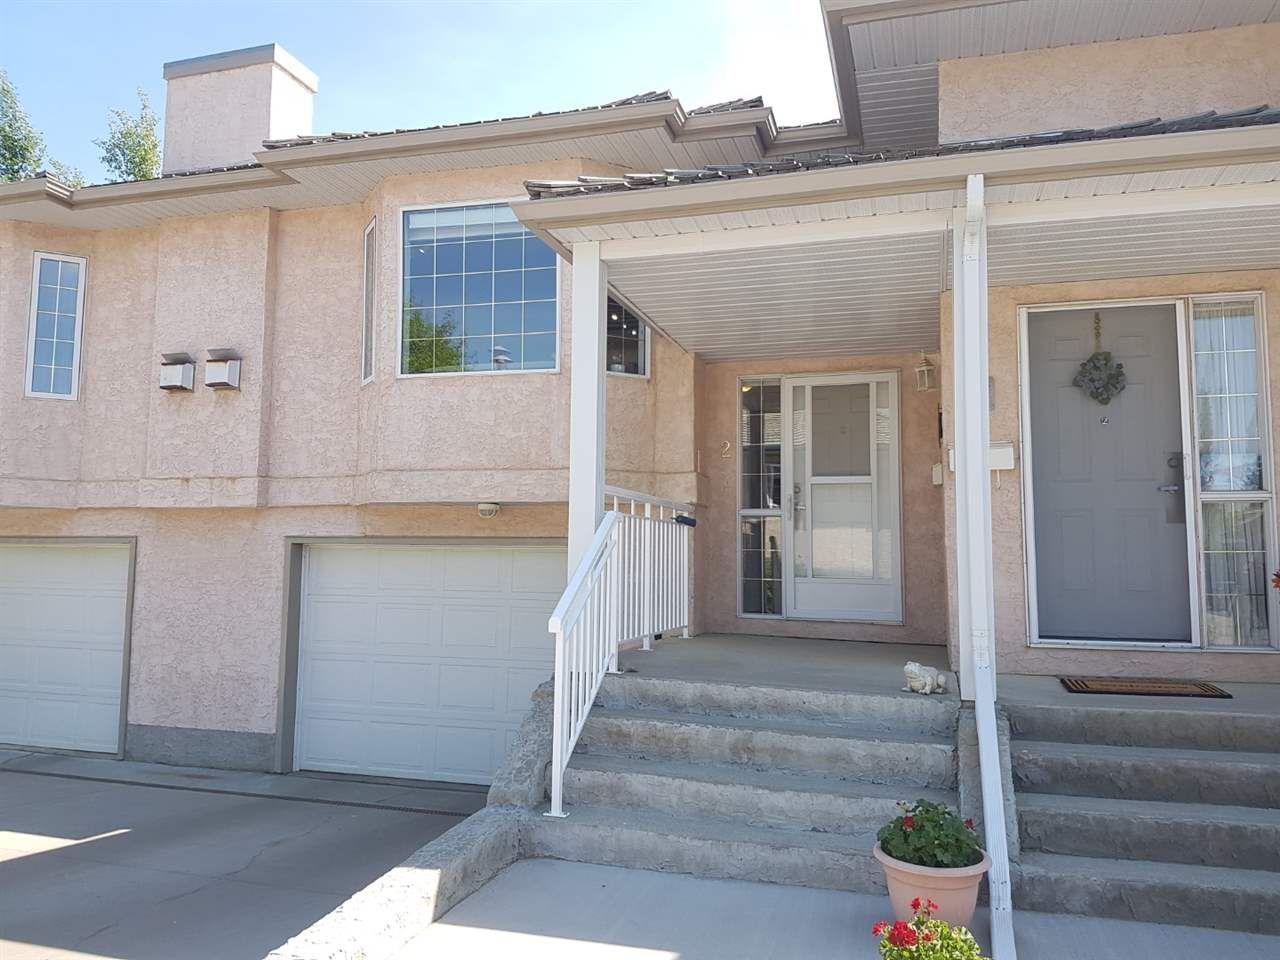 Main Photo: 2 30 Giroux Road: St. Albert Townhouse for sale : MLS®# E4124253